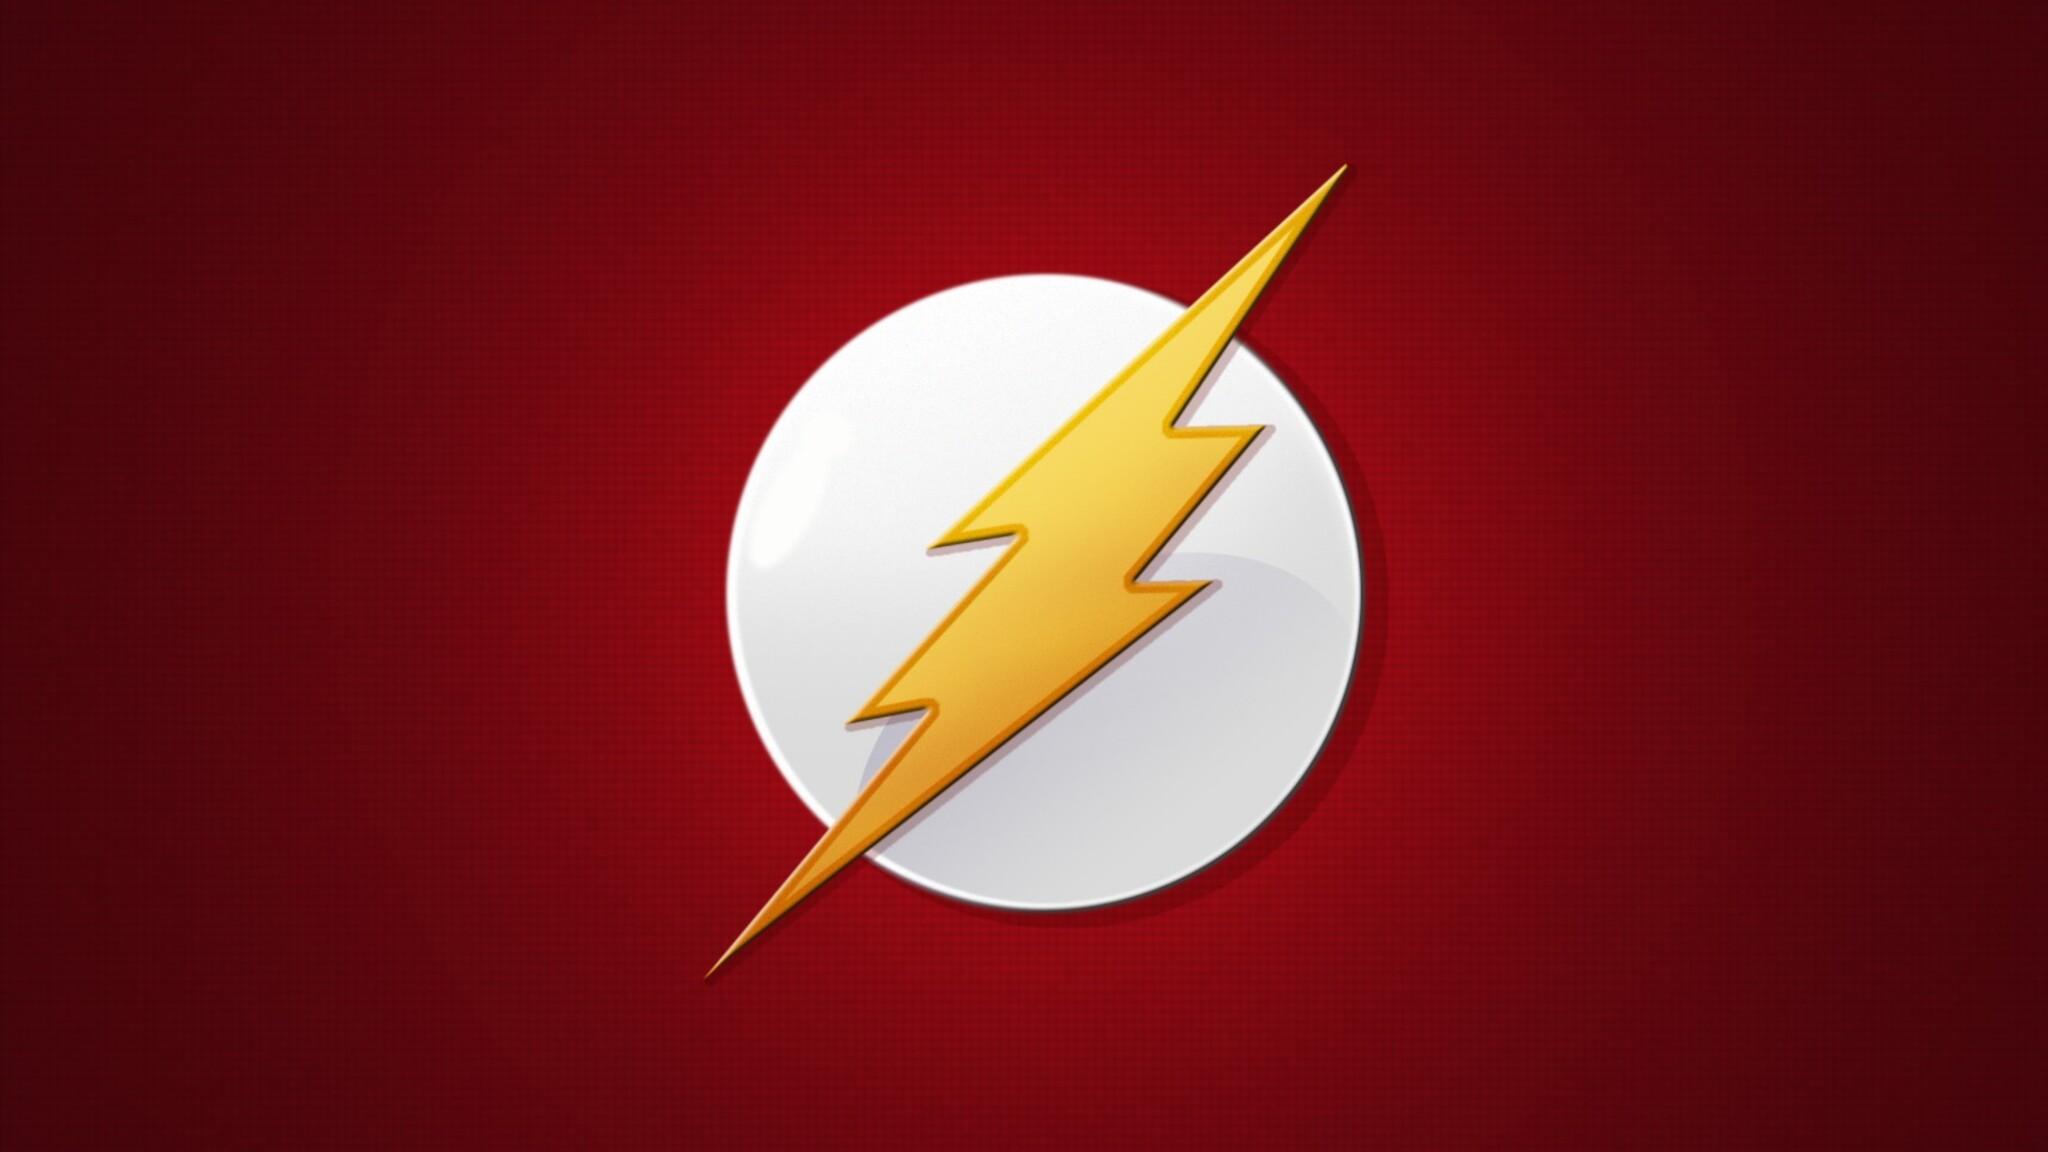 2048x1152 the flash logo 2048x1152 resolution hd 4k